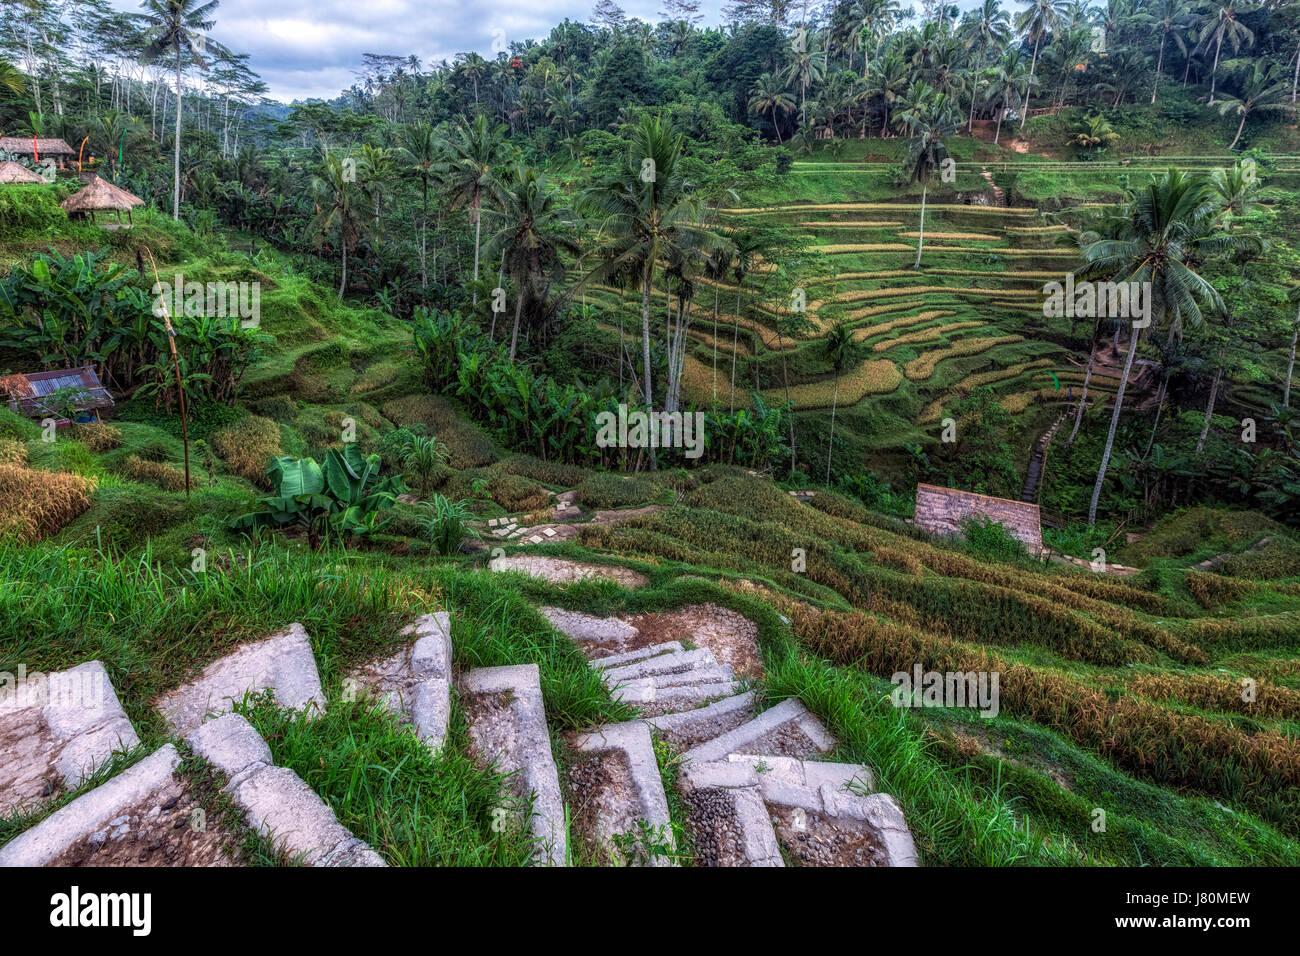 Tegalalang, Rice Fields, Ubud, Bali, Indonesia, Asia - Stock Image